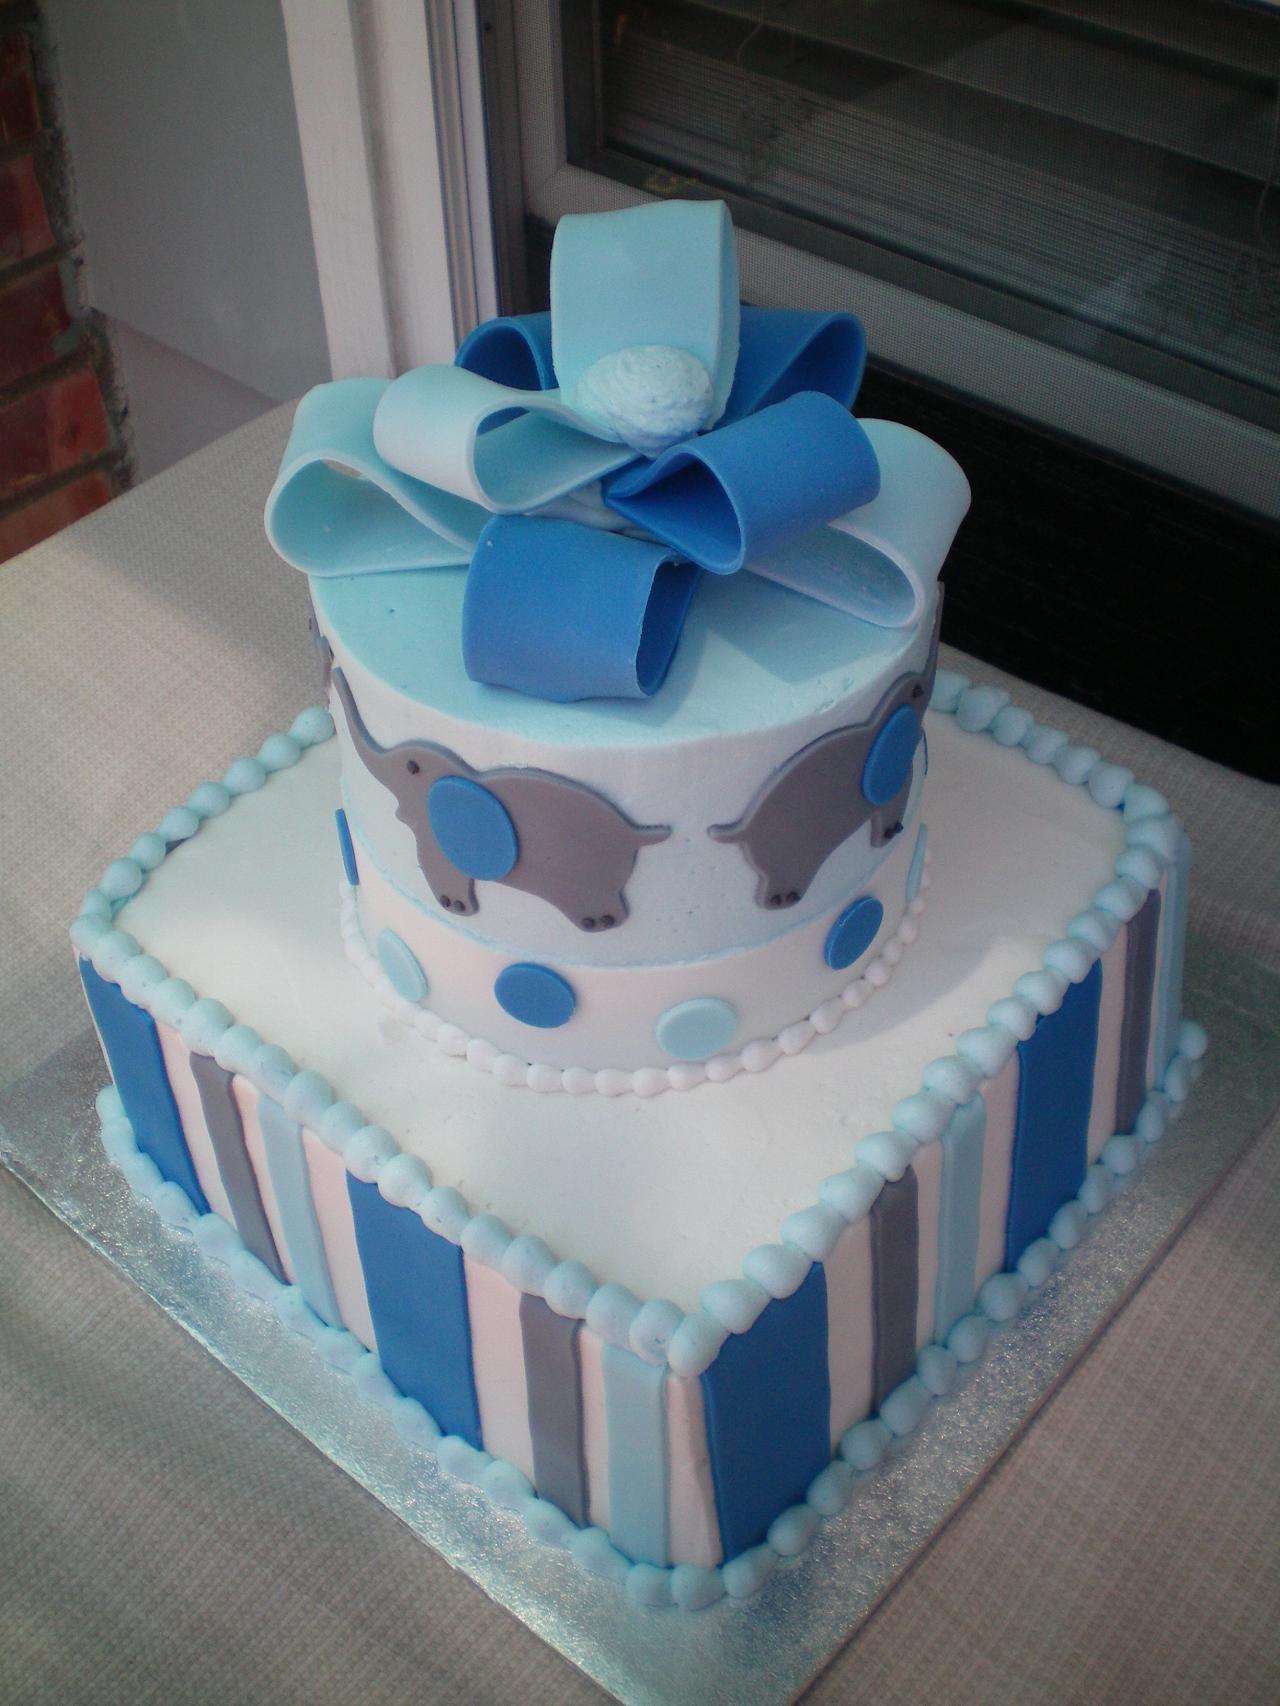 Baby Shower Cakes Elephants ~ Elephant baby shower cake allaboutrachelacakes